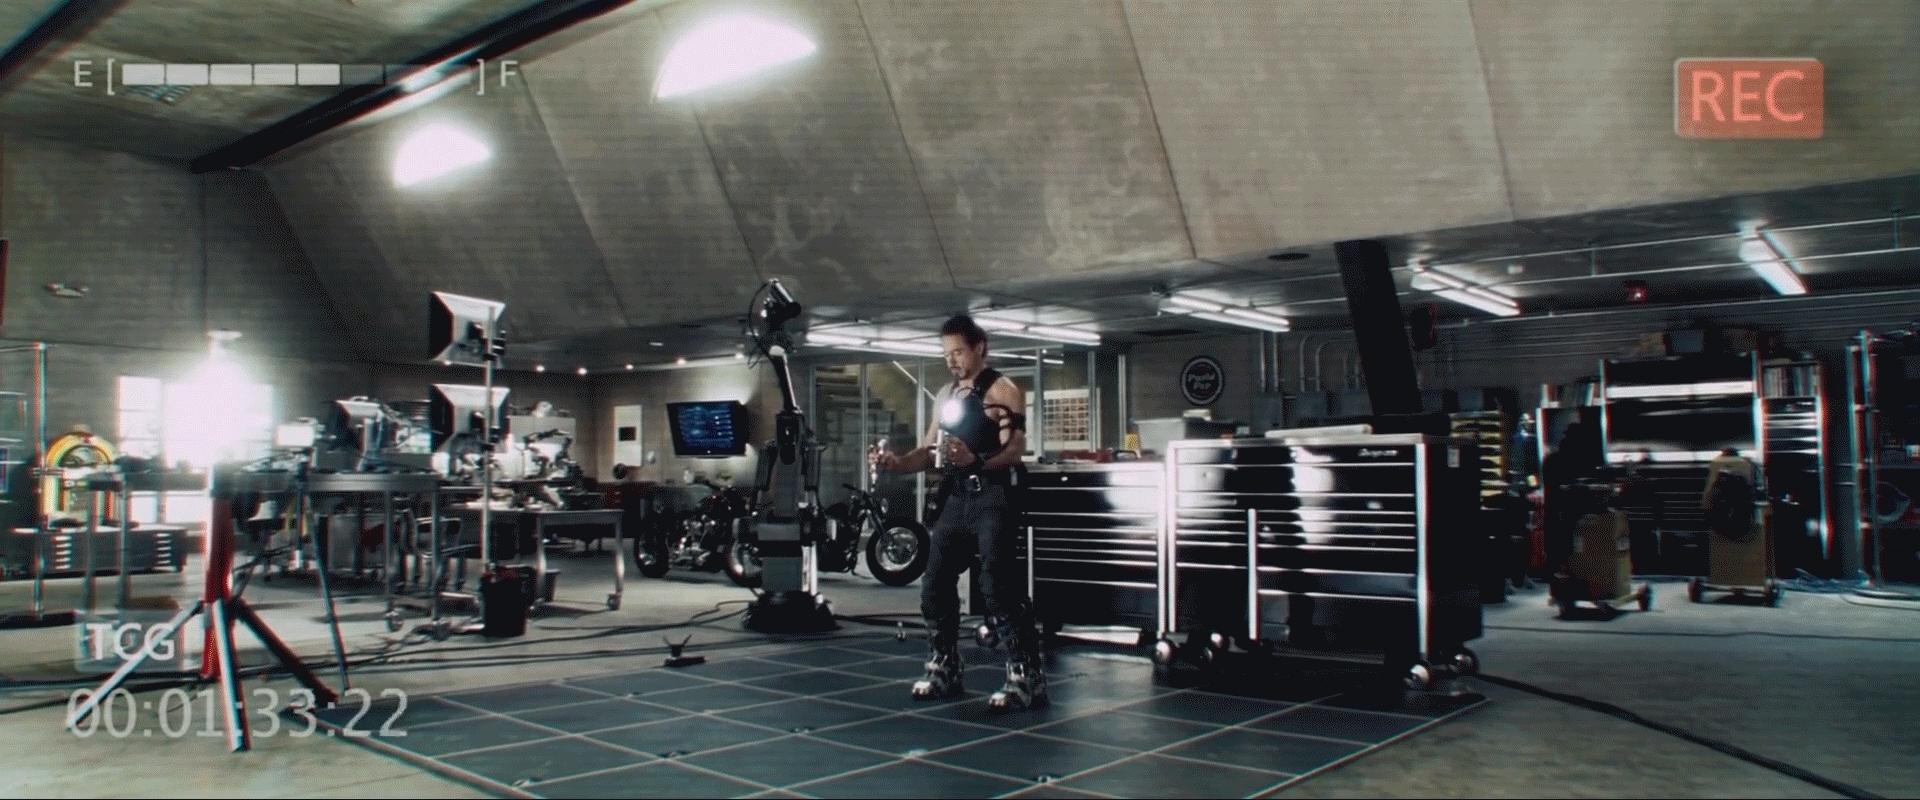 tarantinogifs, Iron Man Fail (reddit) GIFs